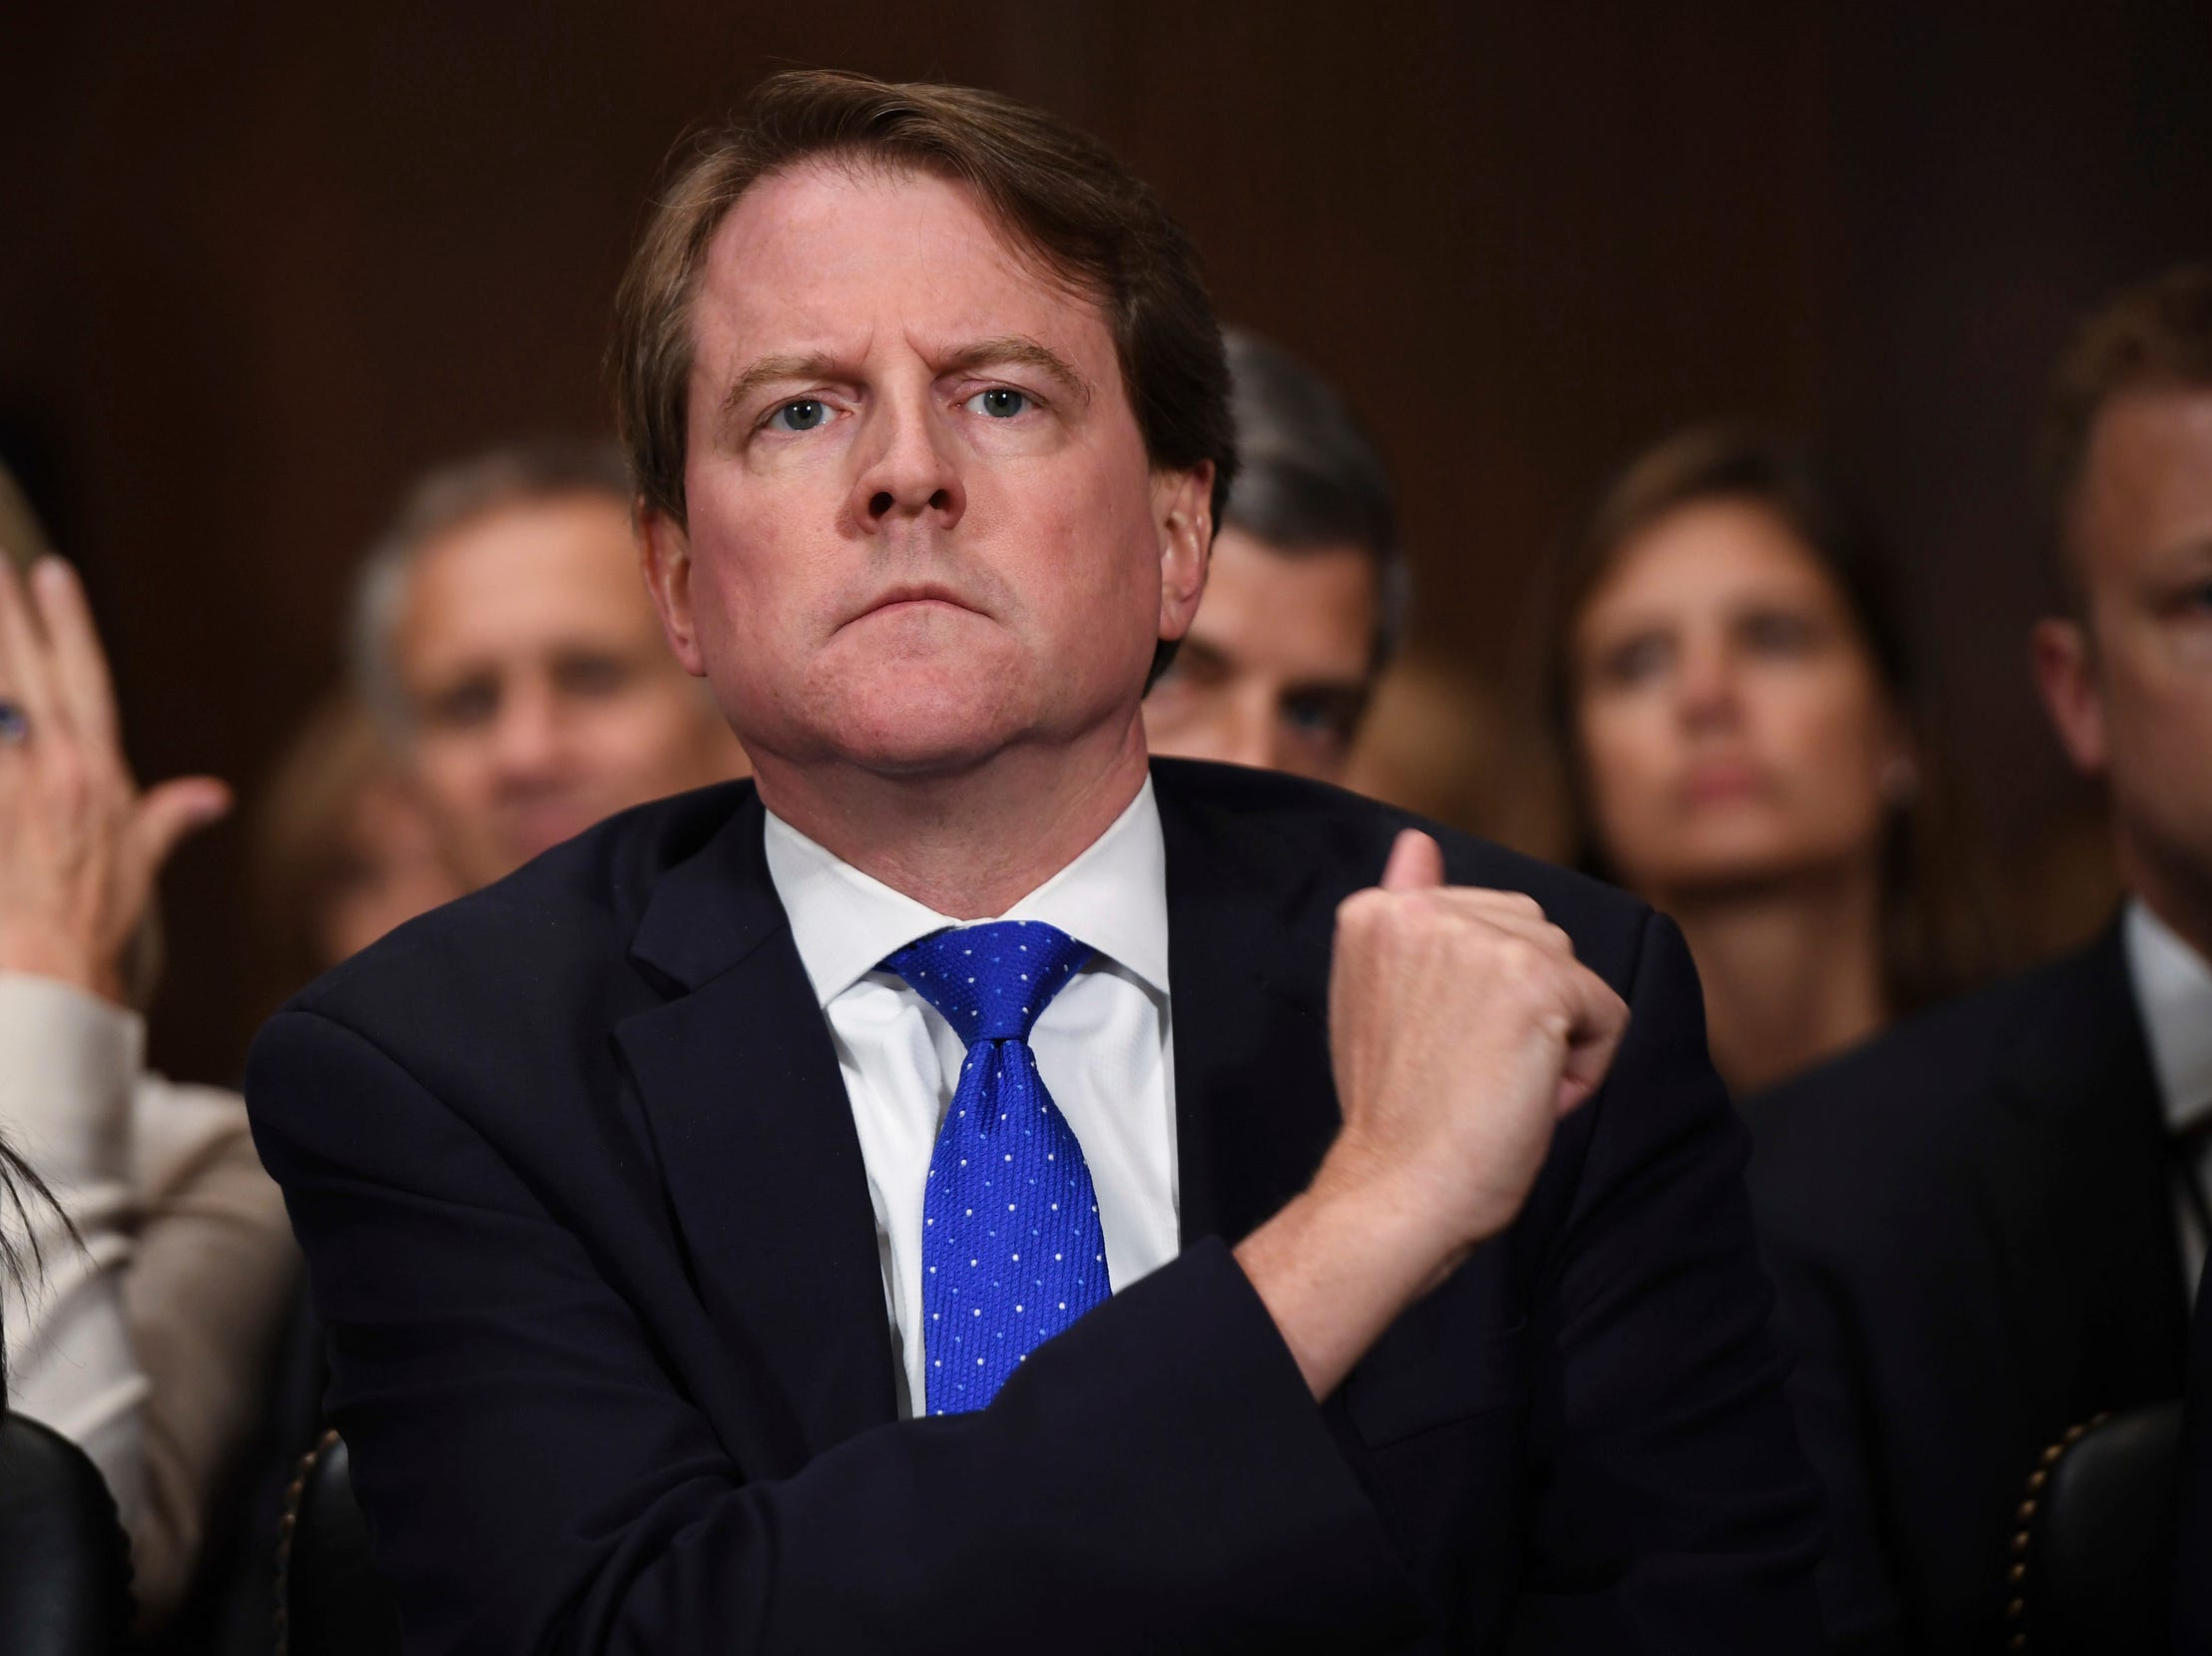 White House counsel Don McGahn listens as Supreme court nominee Brett Kavanaugh testifies before the Senate Judiciary Committee, Thursday.